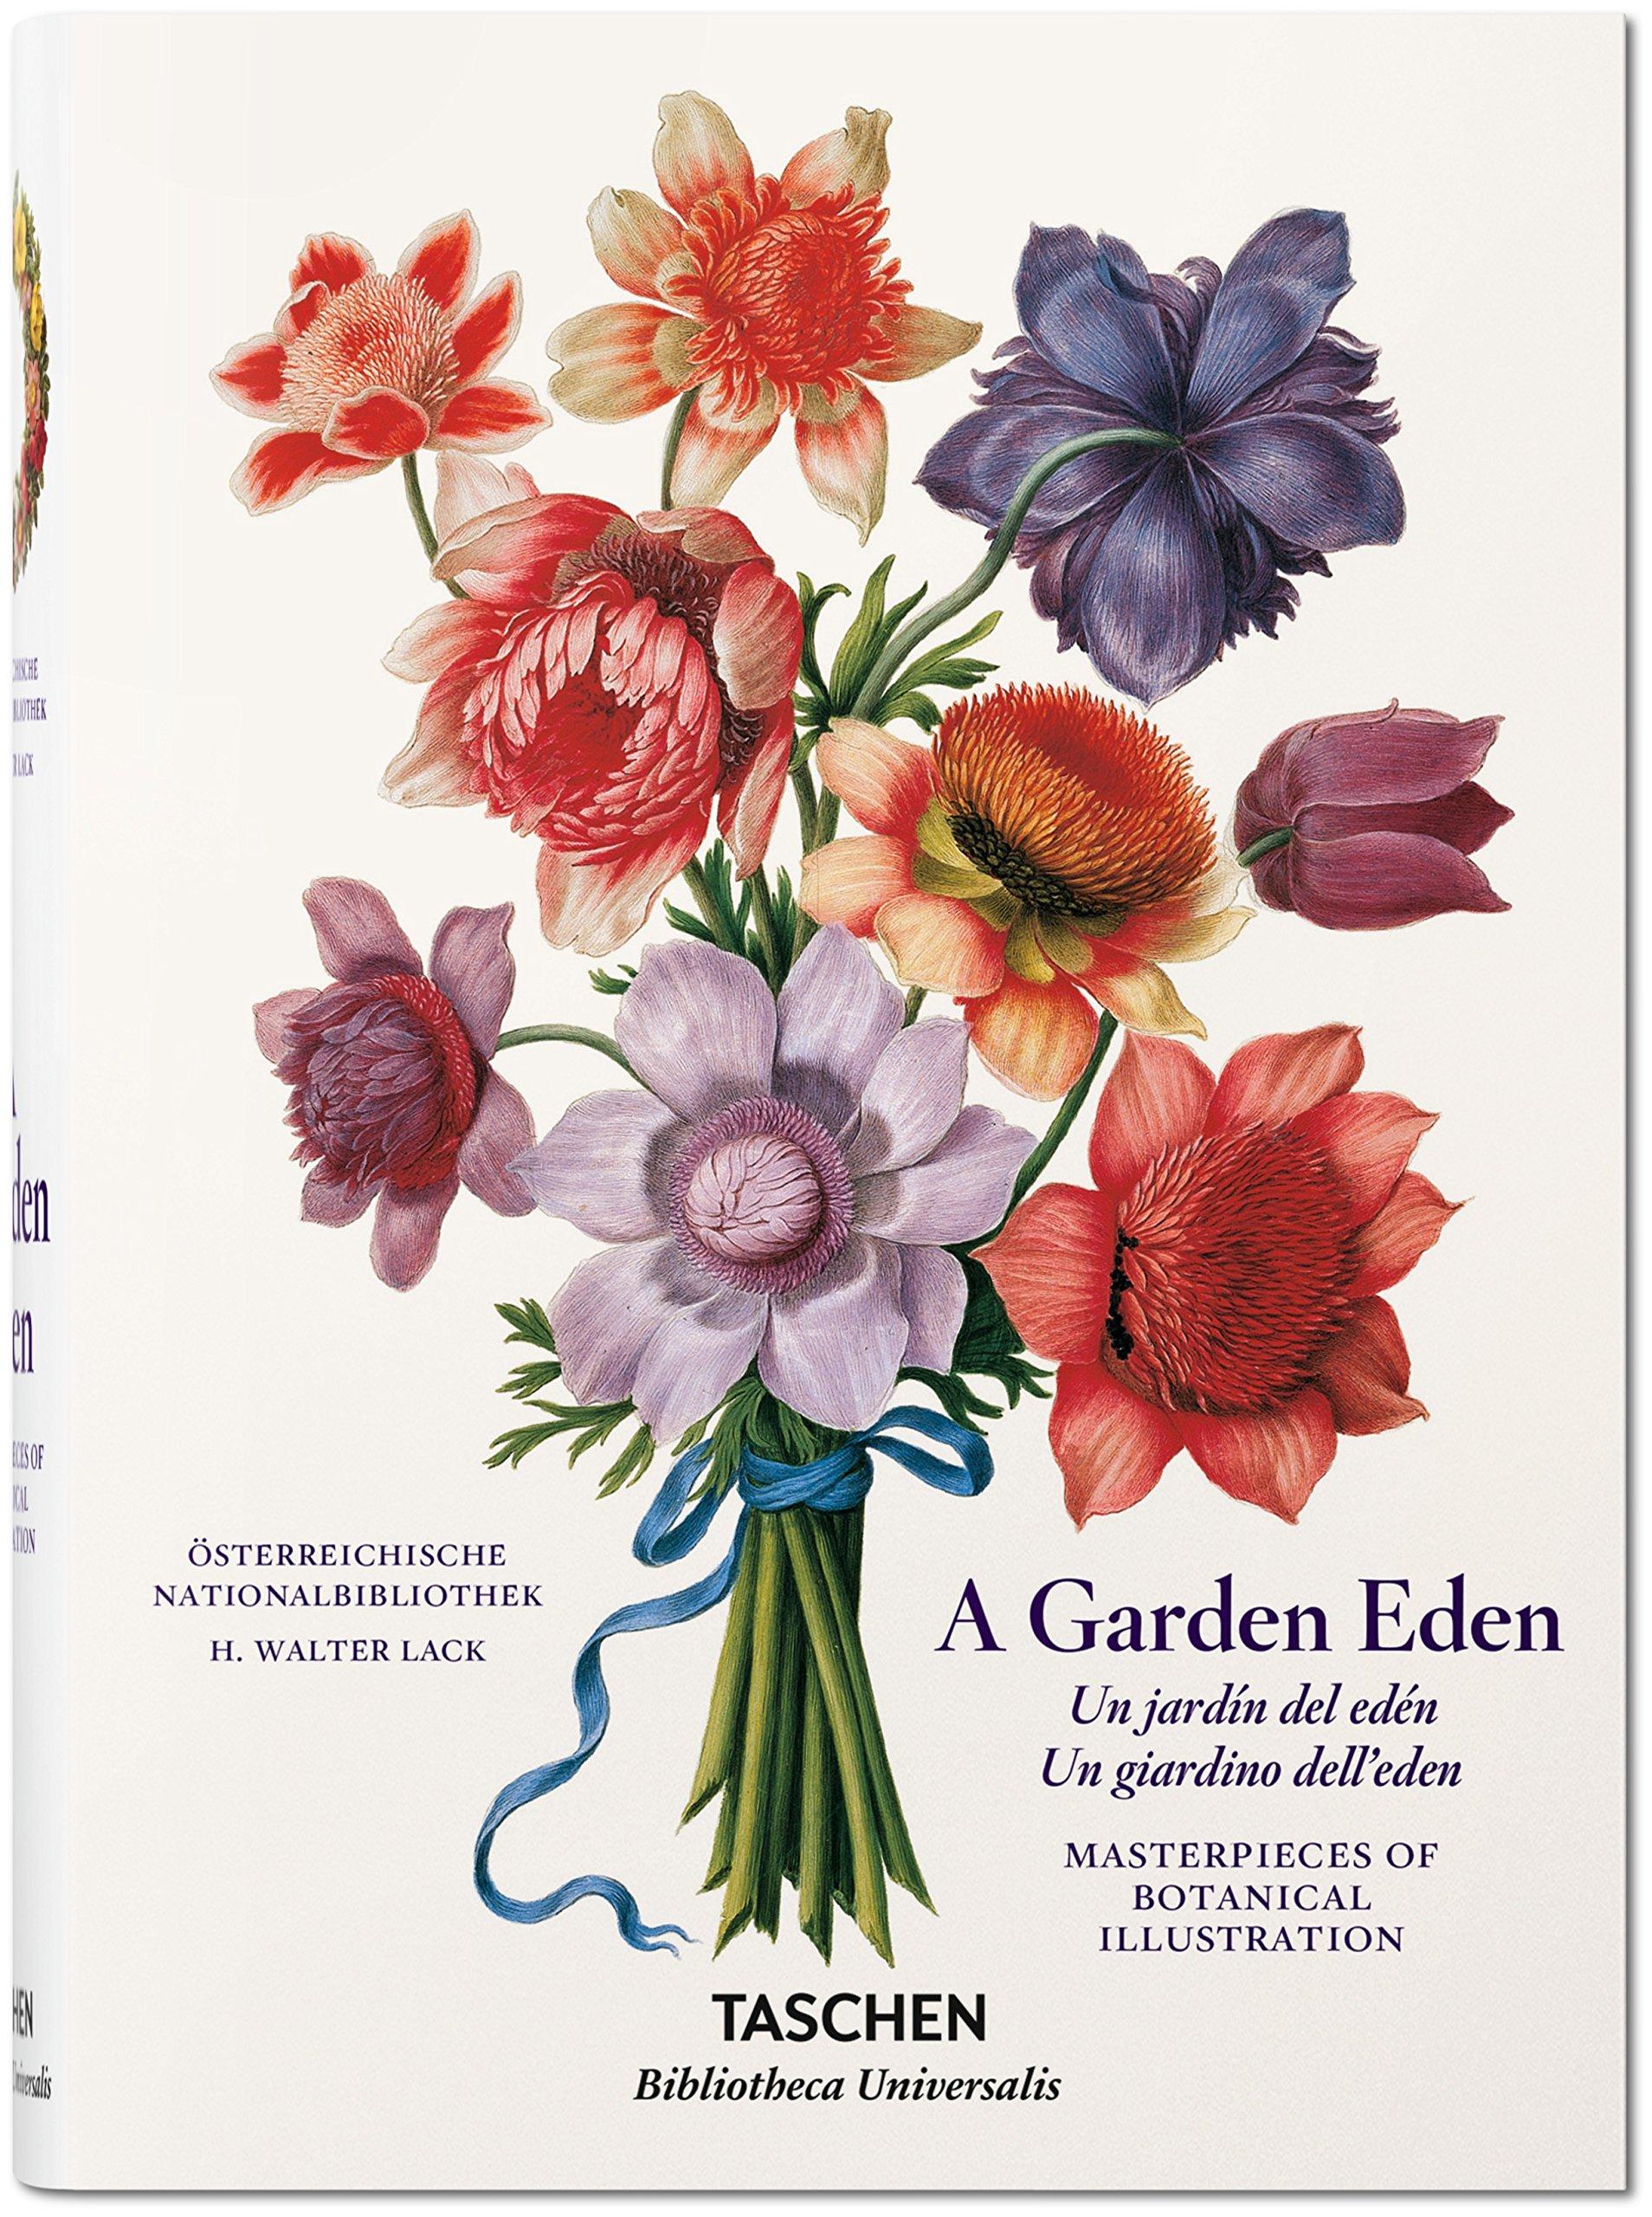 Maravillas De La Botánica Láminas Para Enmarcar Posters Art: Amazon ...